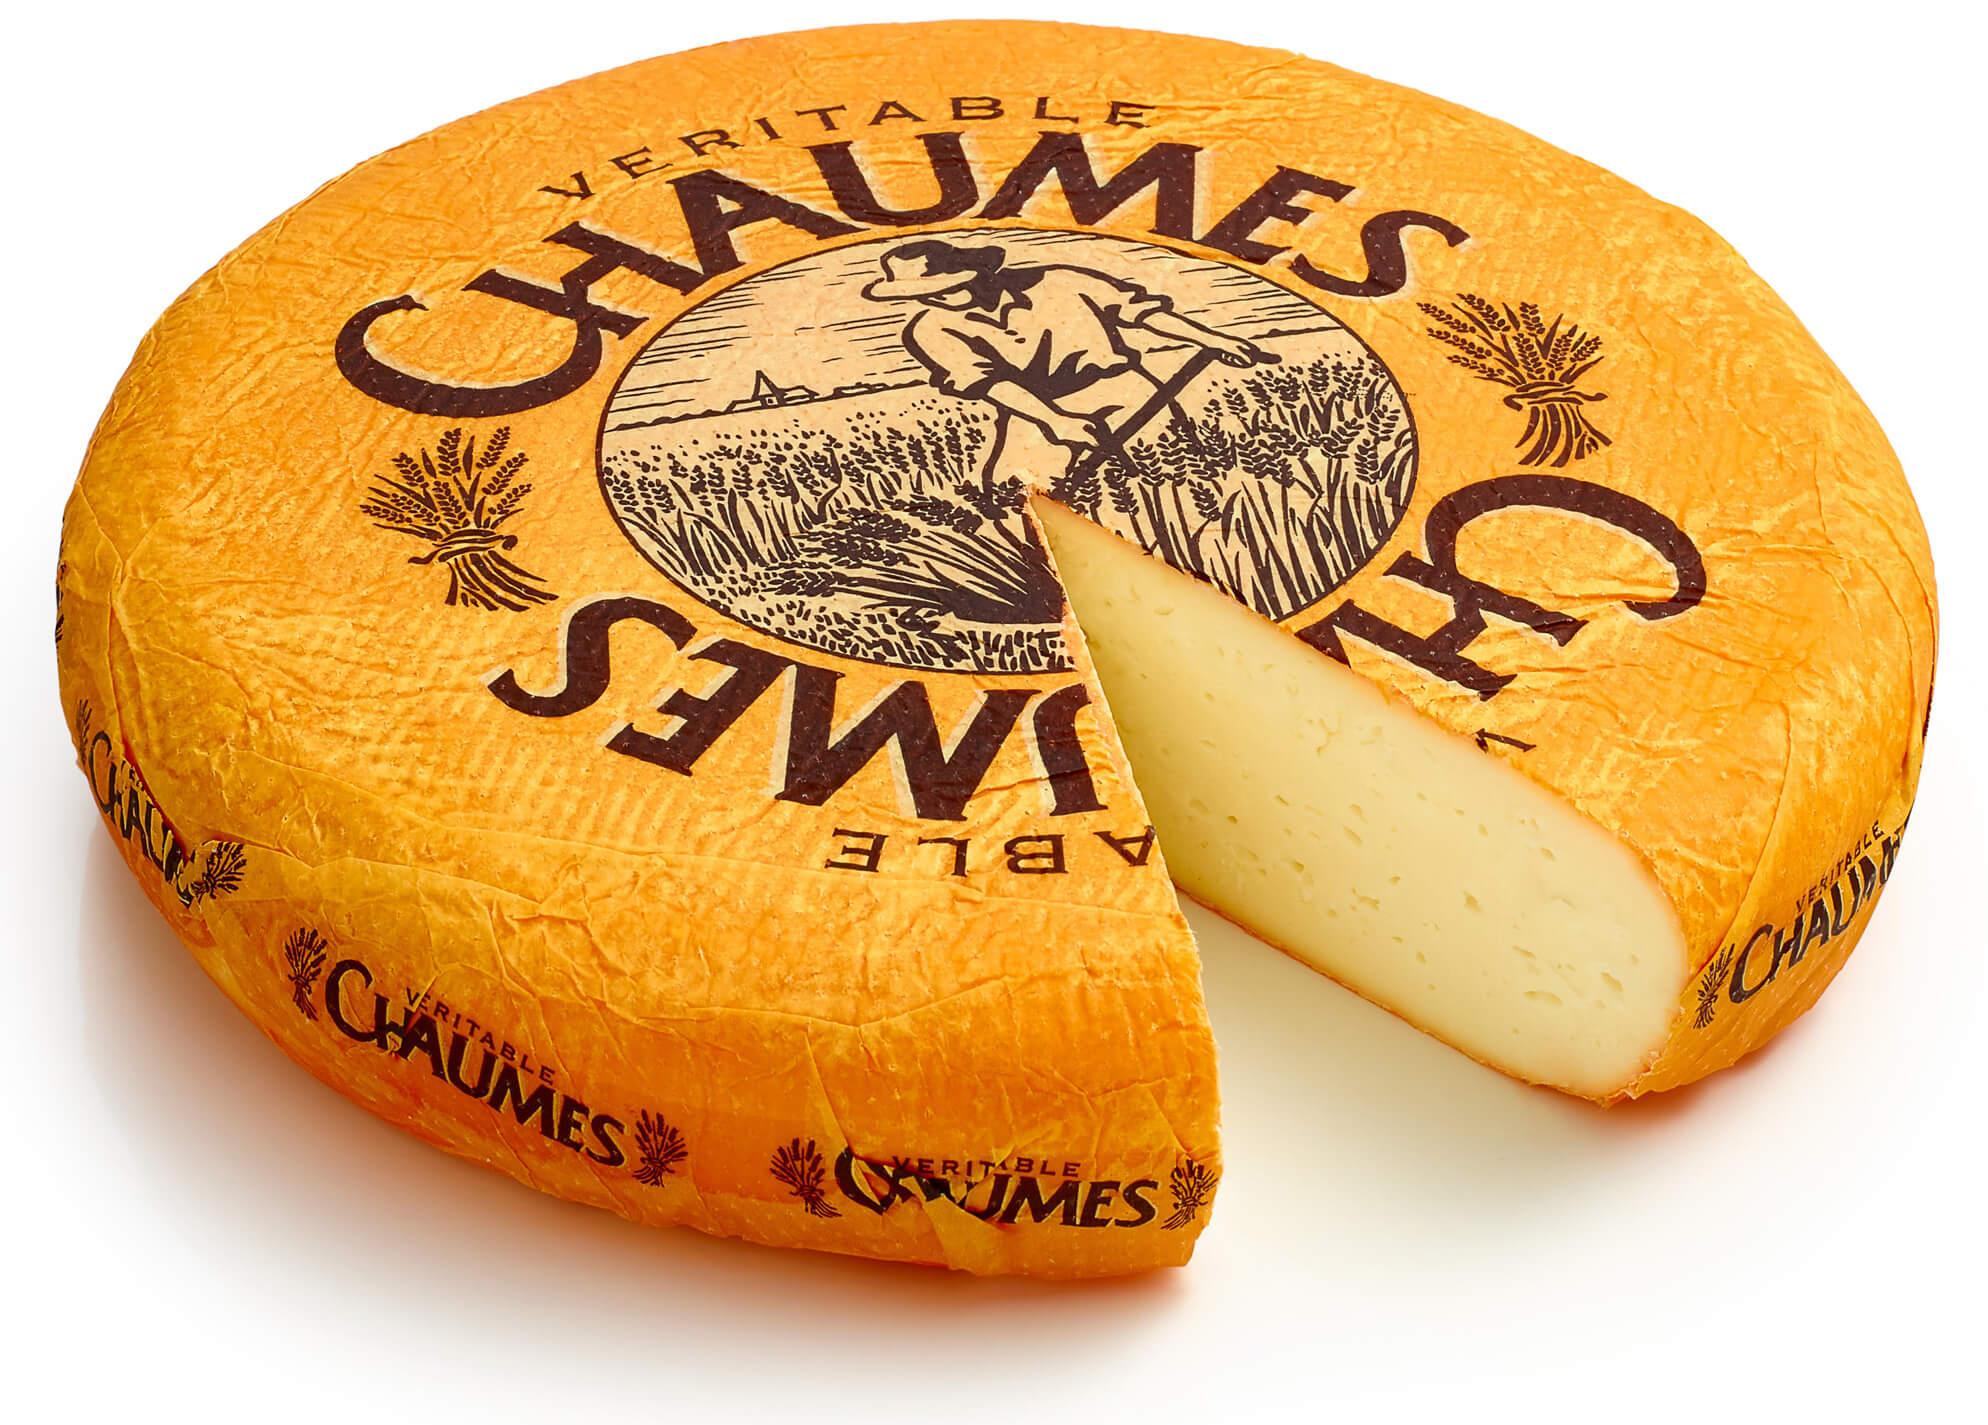 Сыр Chaumes